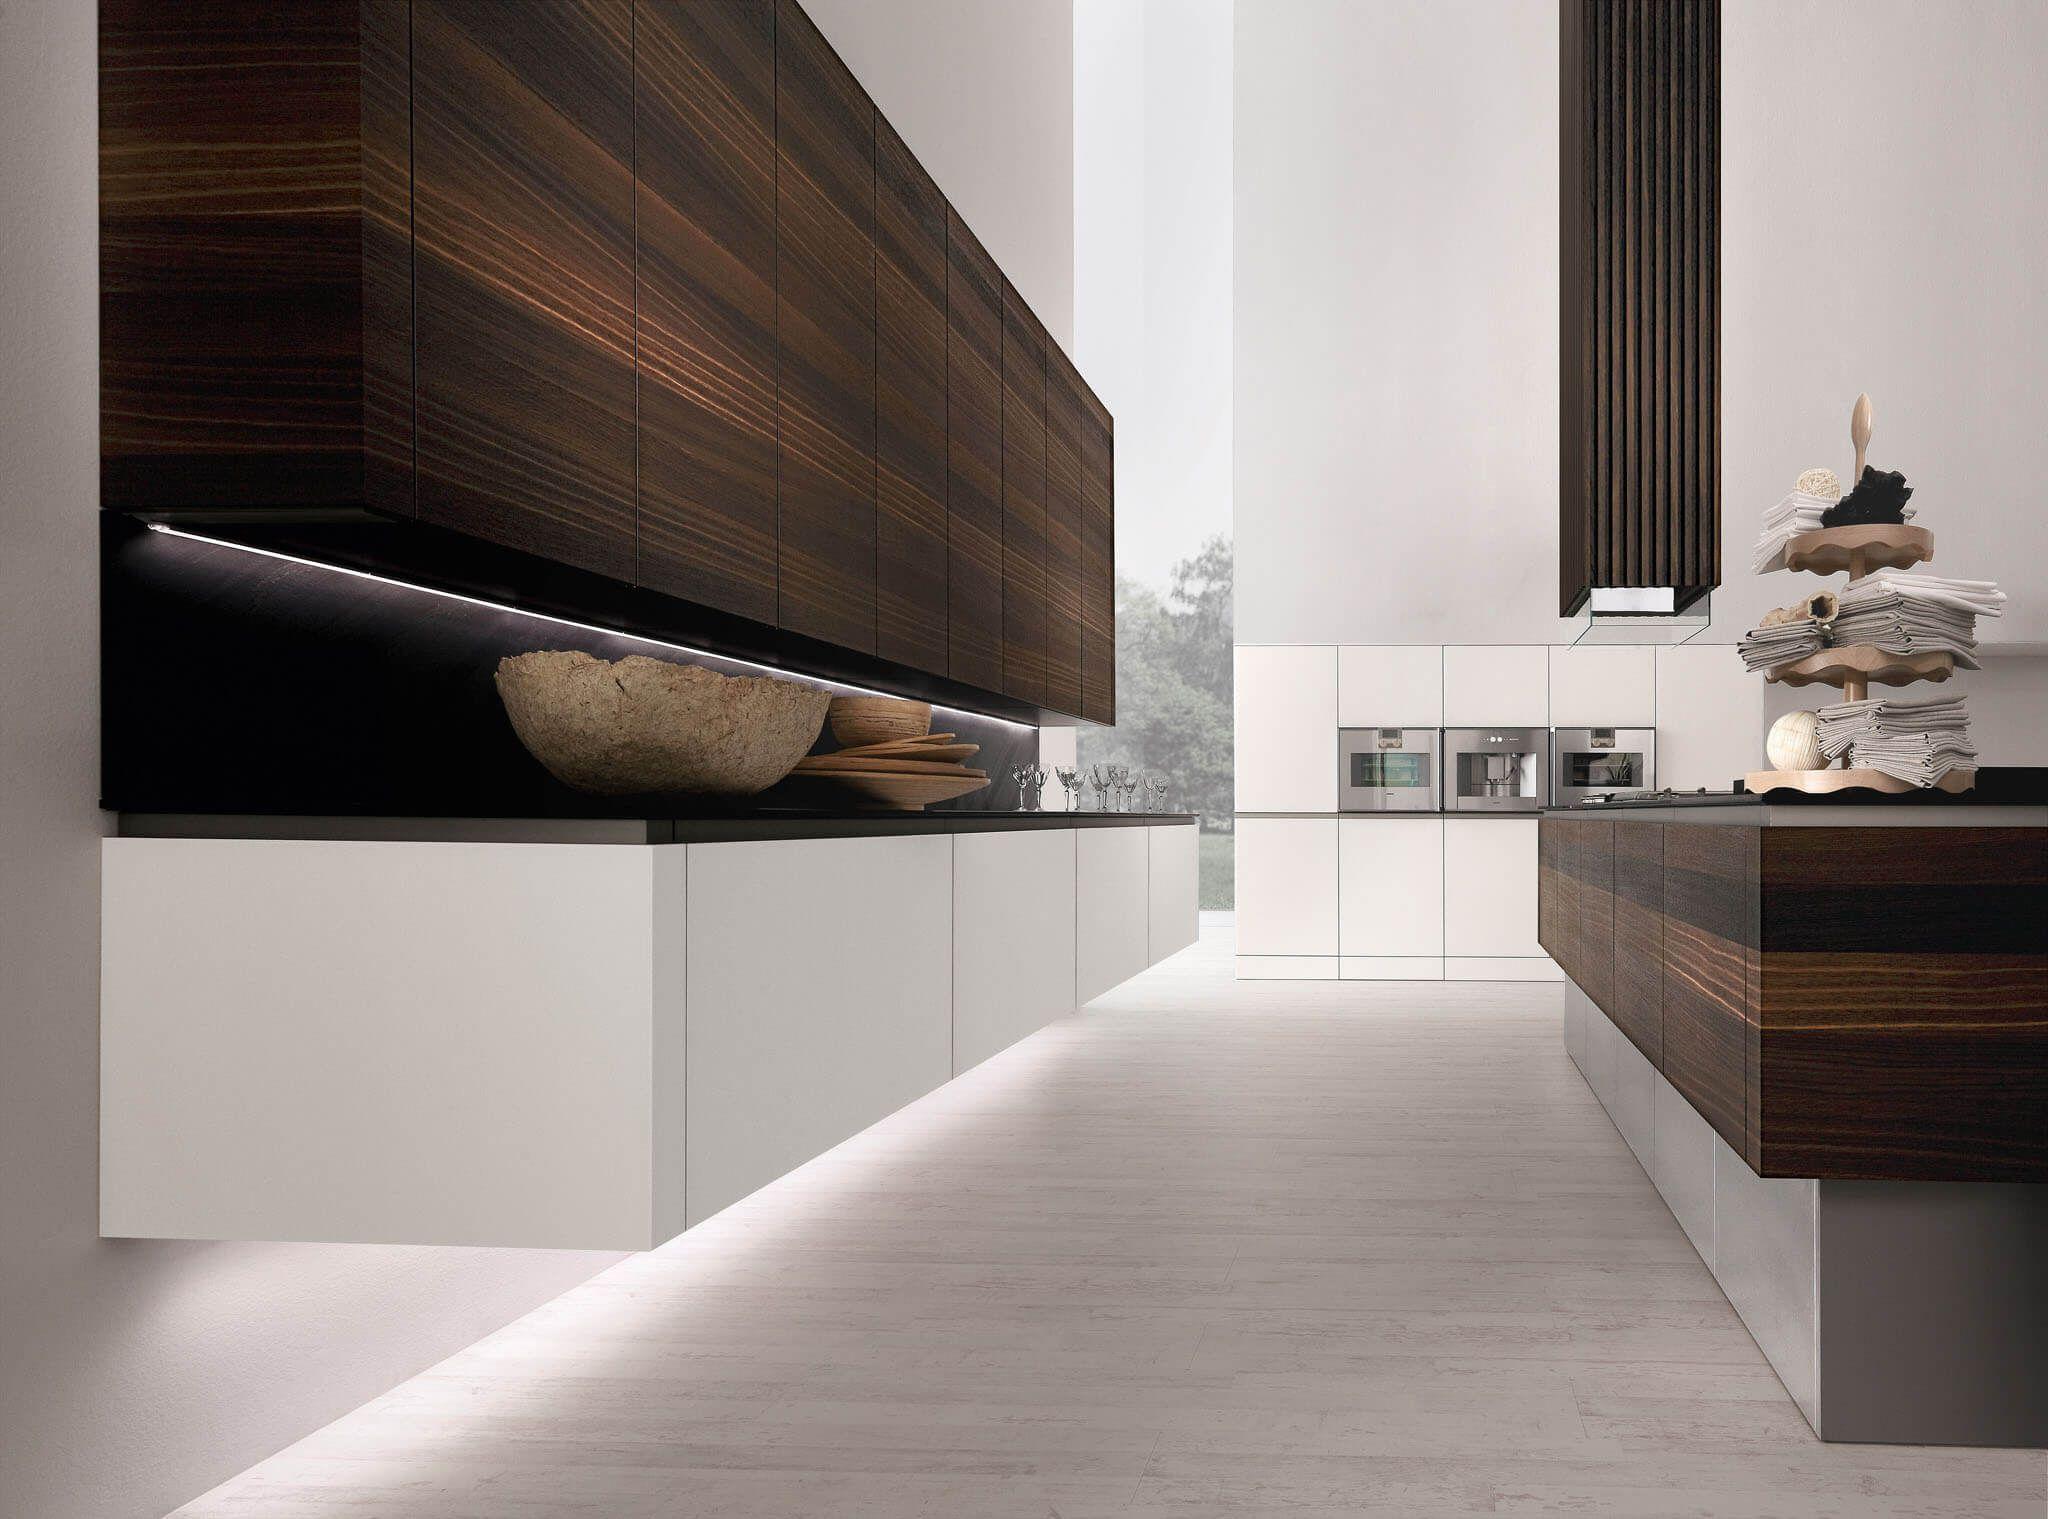 Zwevende Open Keuken : Zwevende keukens keuken pinterest searching